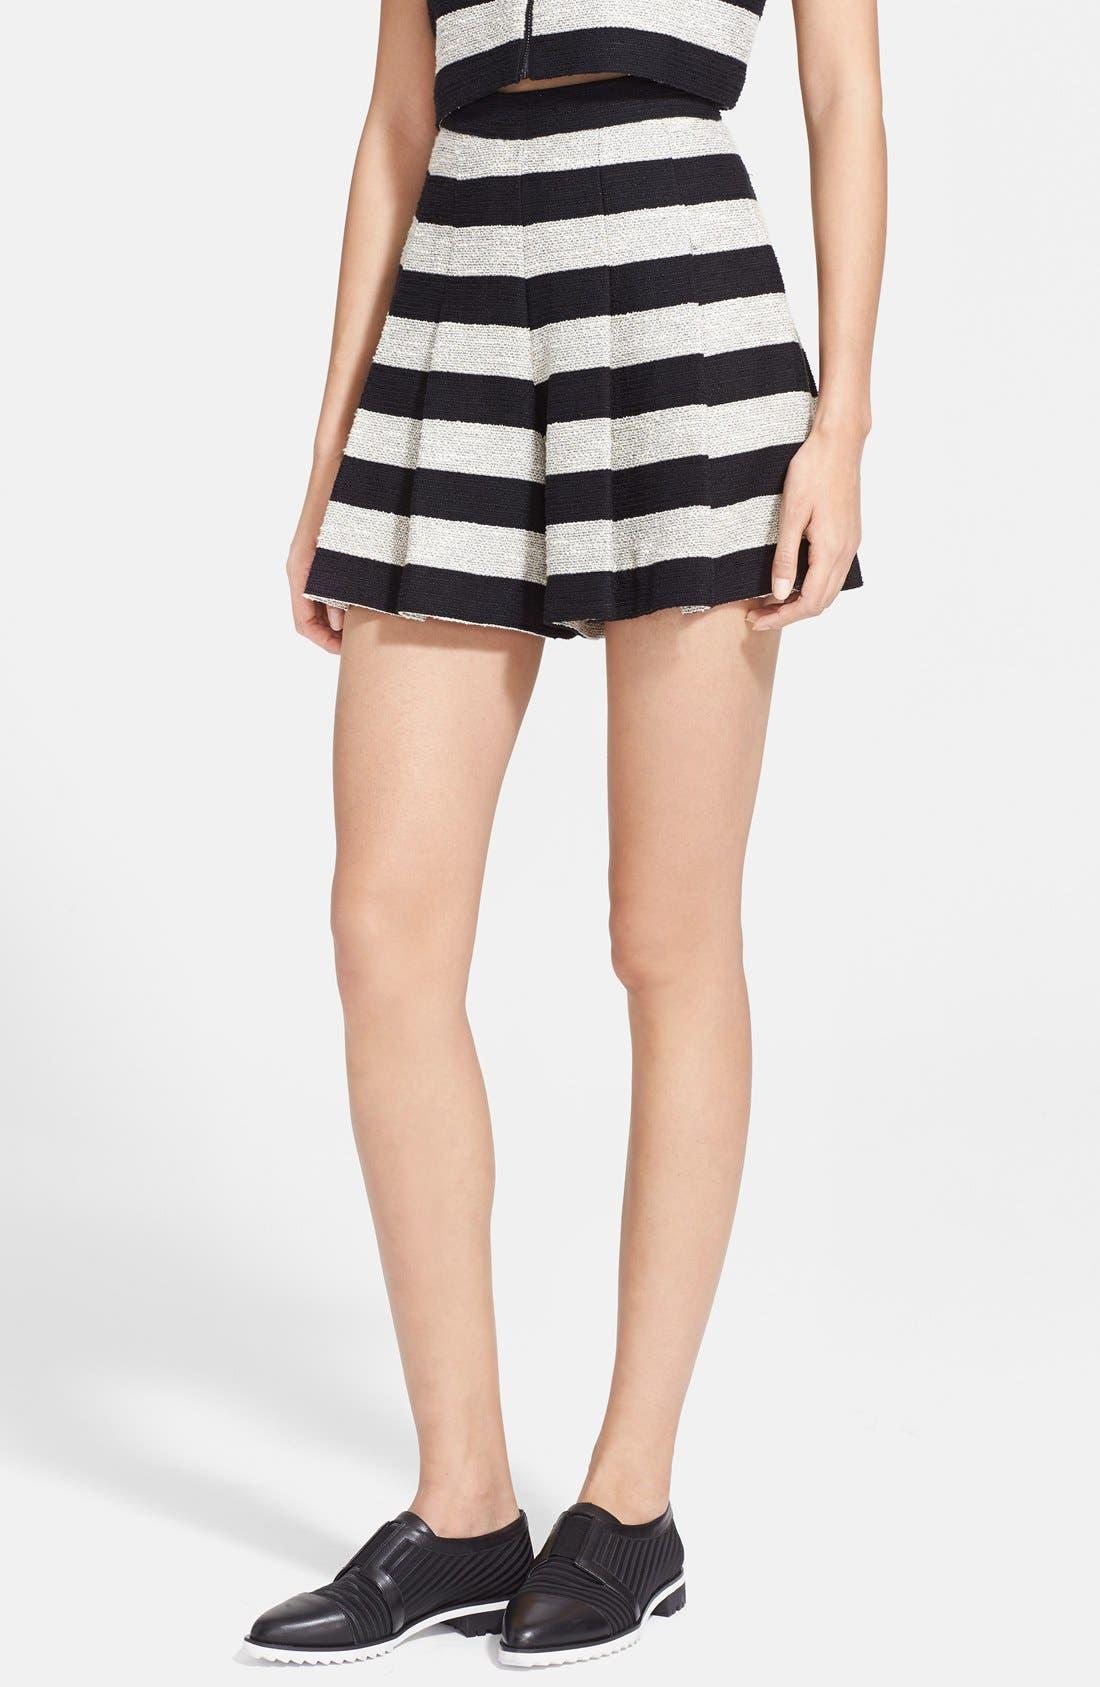 Alternate Image 1 Selected - Alice + Olivia Stripe Tweed Skirt